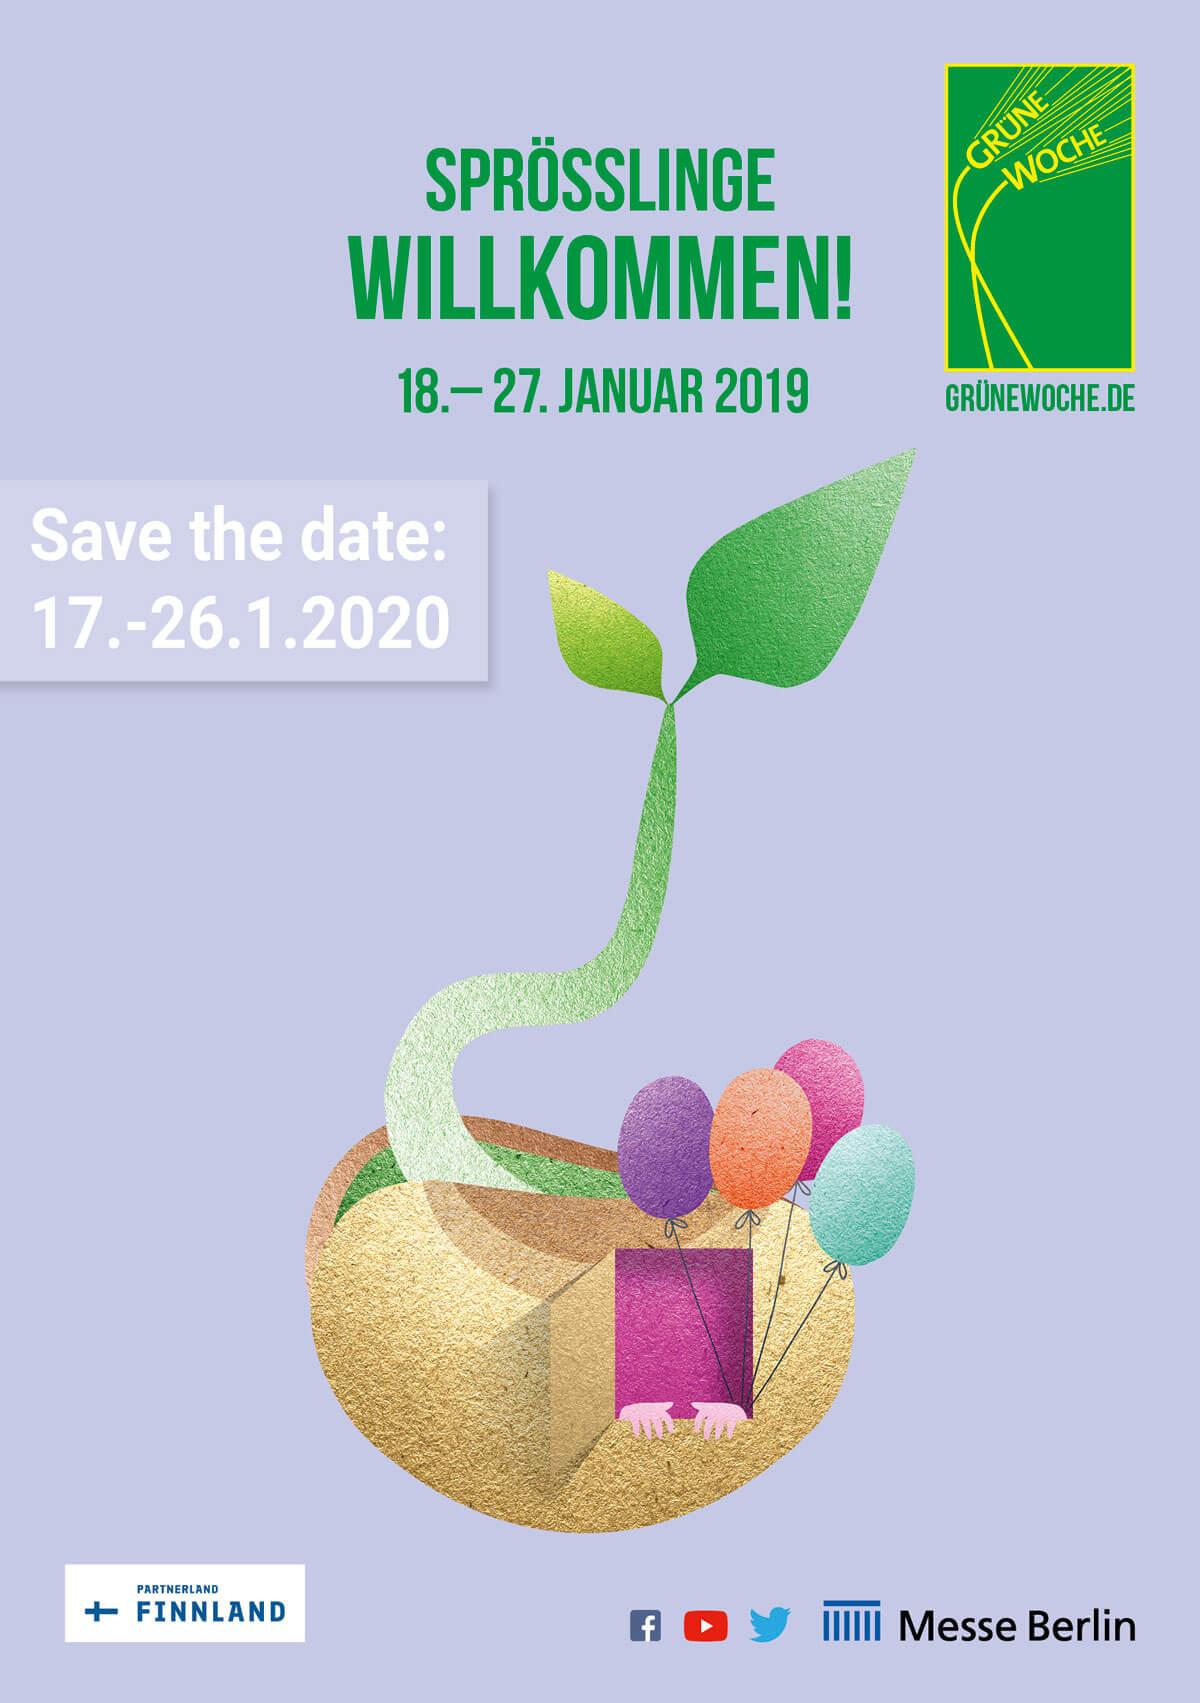 Messeplakat der Internationalen Grünen Woche